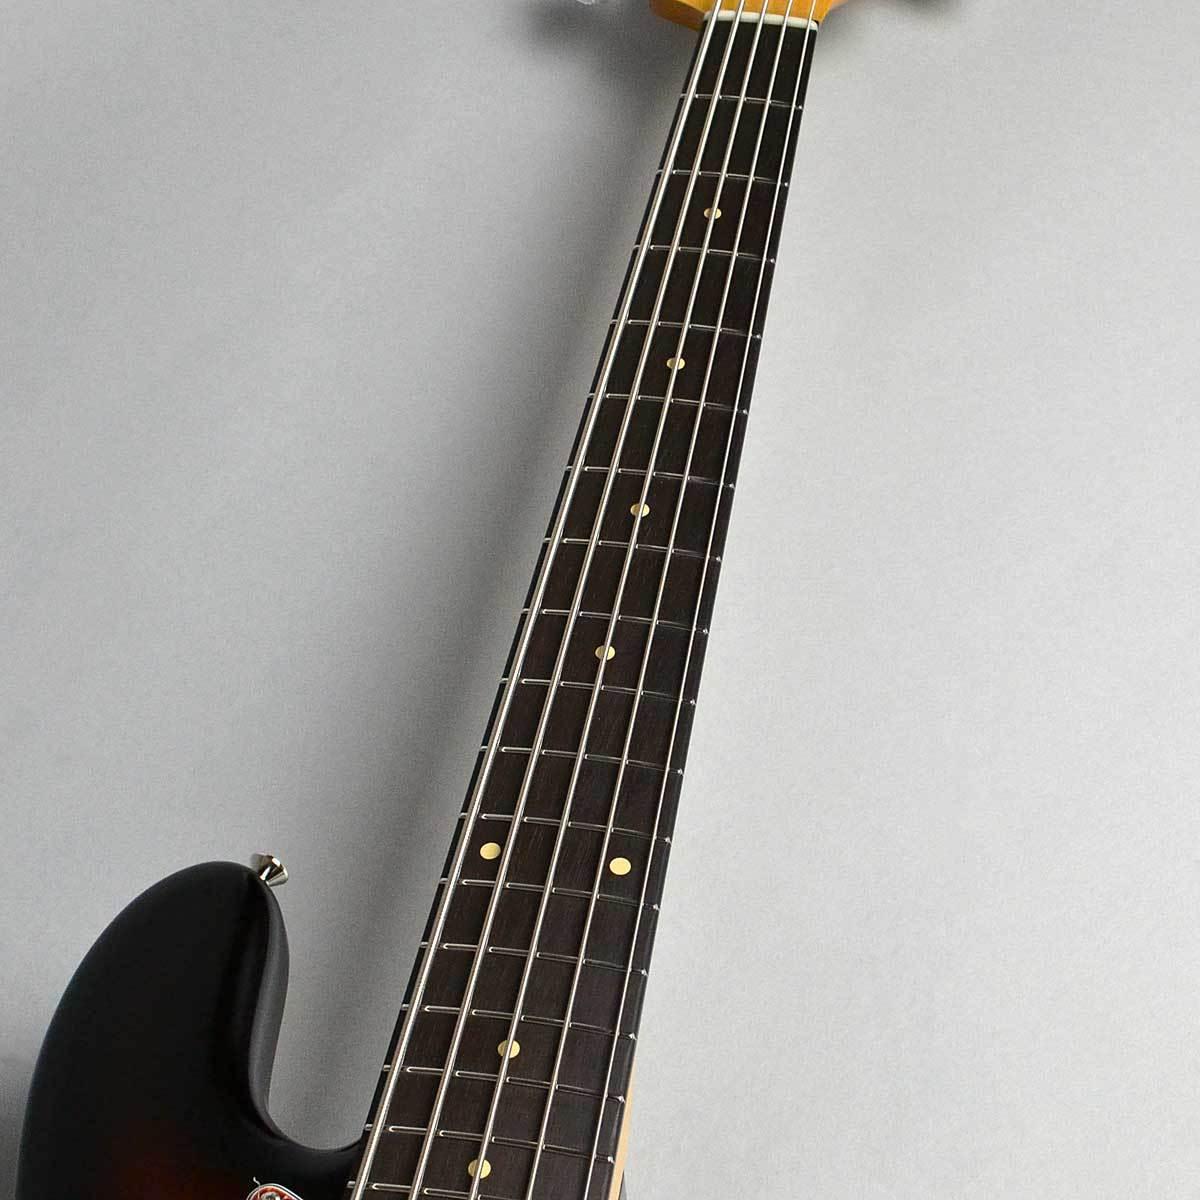 Freedom Custom Guitar Research RESEARCH Retrospective JazzBass 534jSAcLqR5